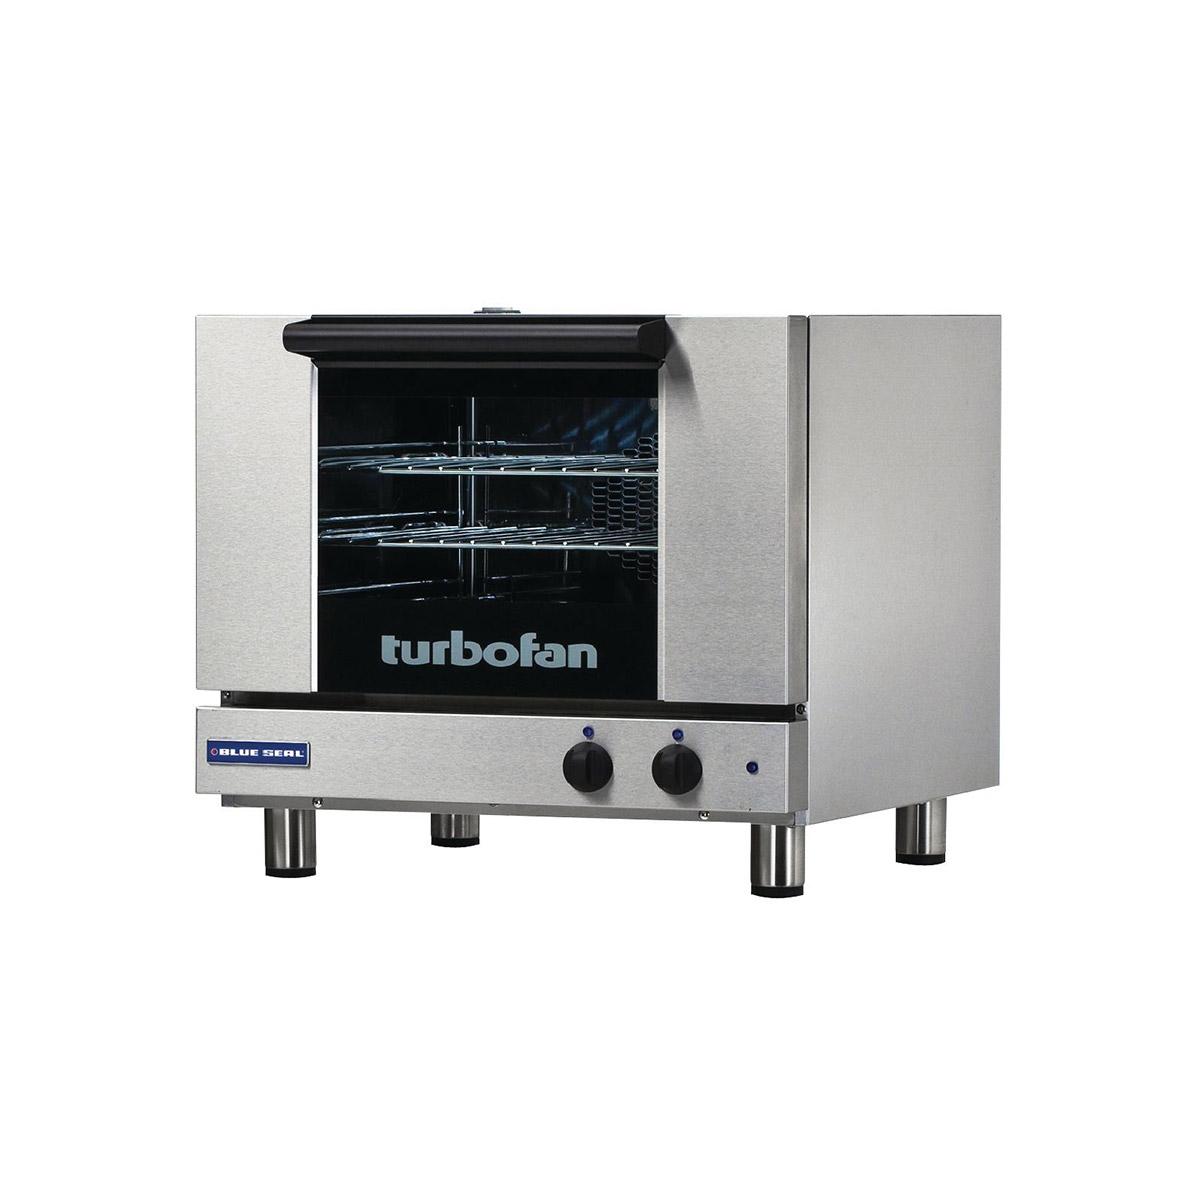 Blue Seal Turbofan Convection Oven E23M3